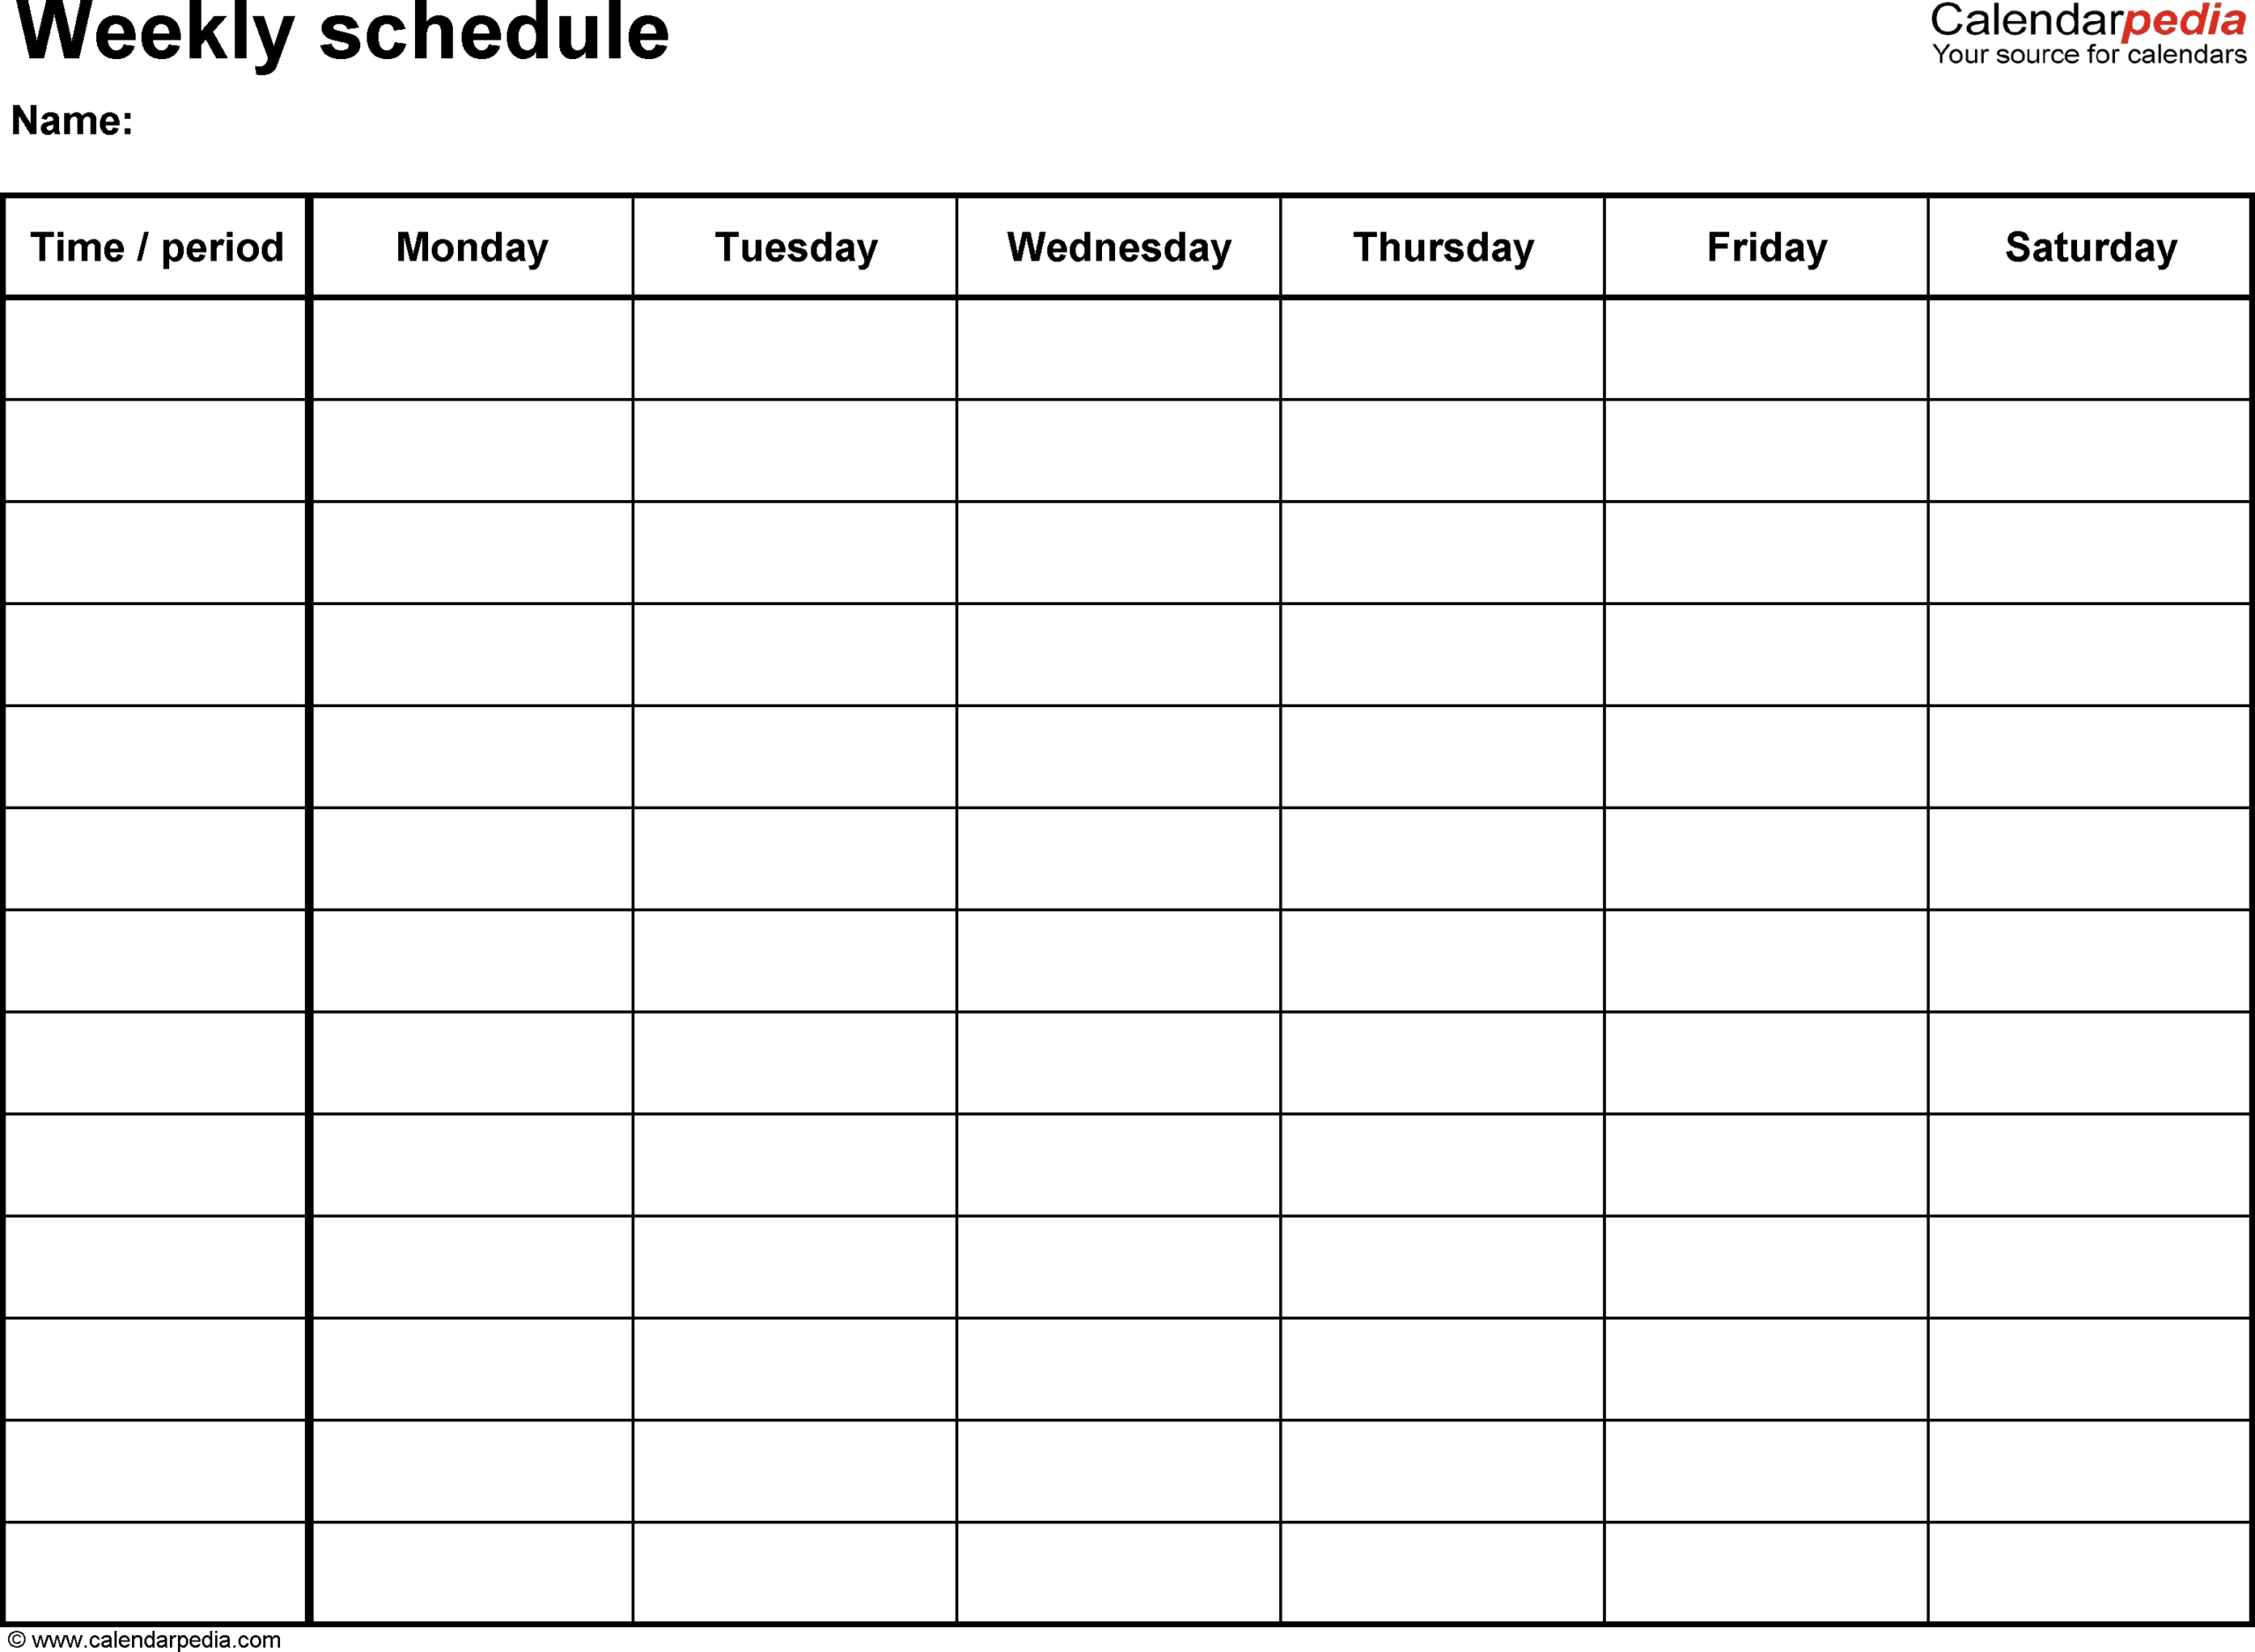 Weekly Schedule Template Monday-Sunday - Template Calendar  Depo Administartion Calendar 2021